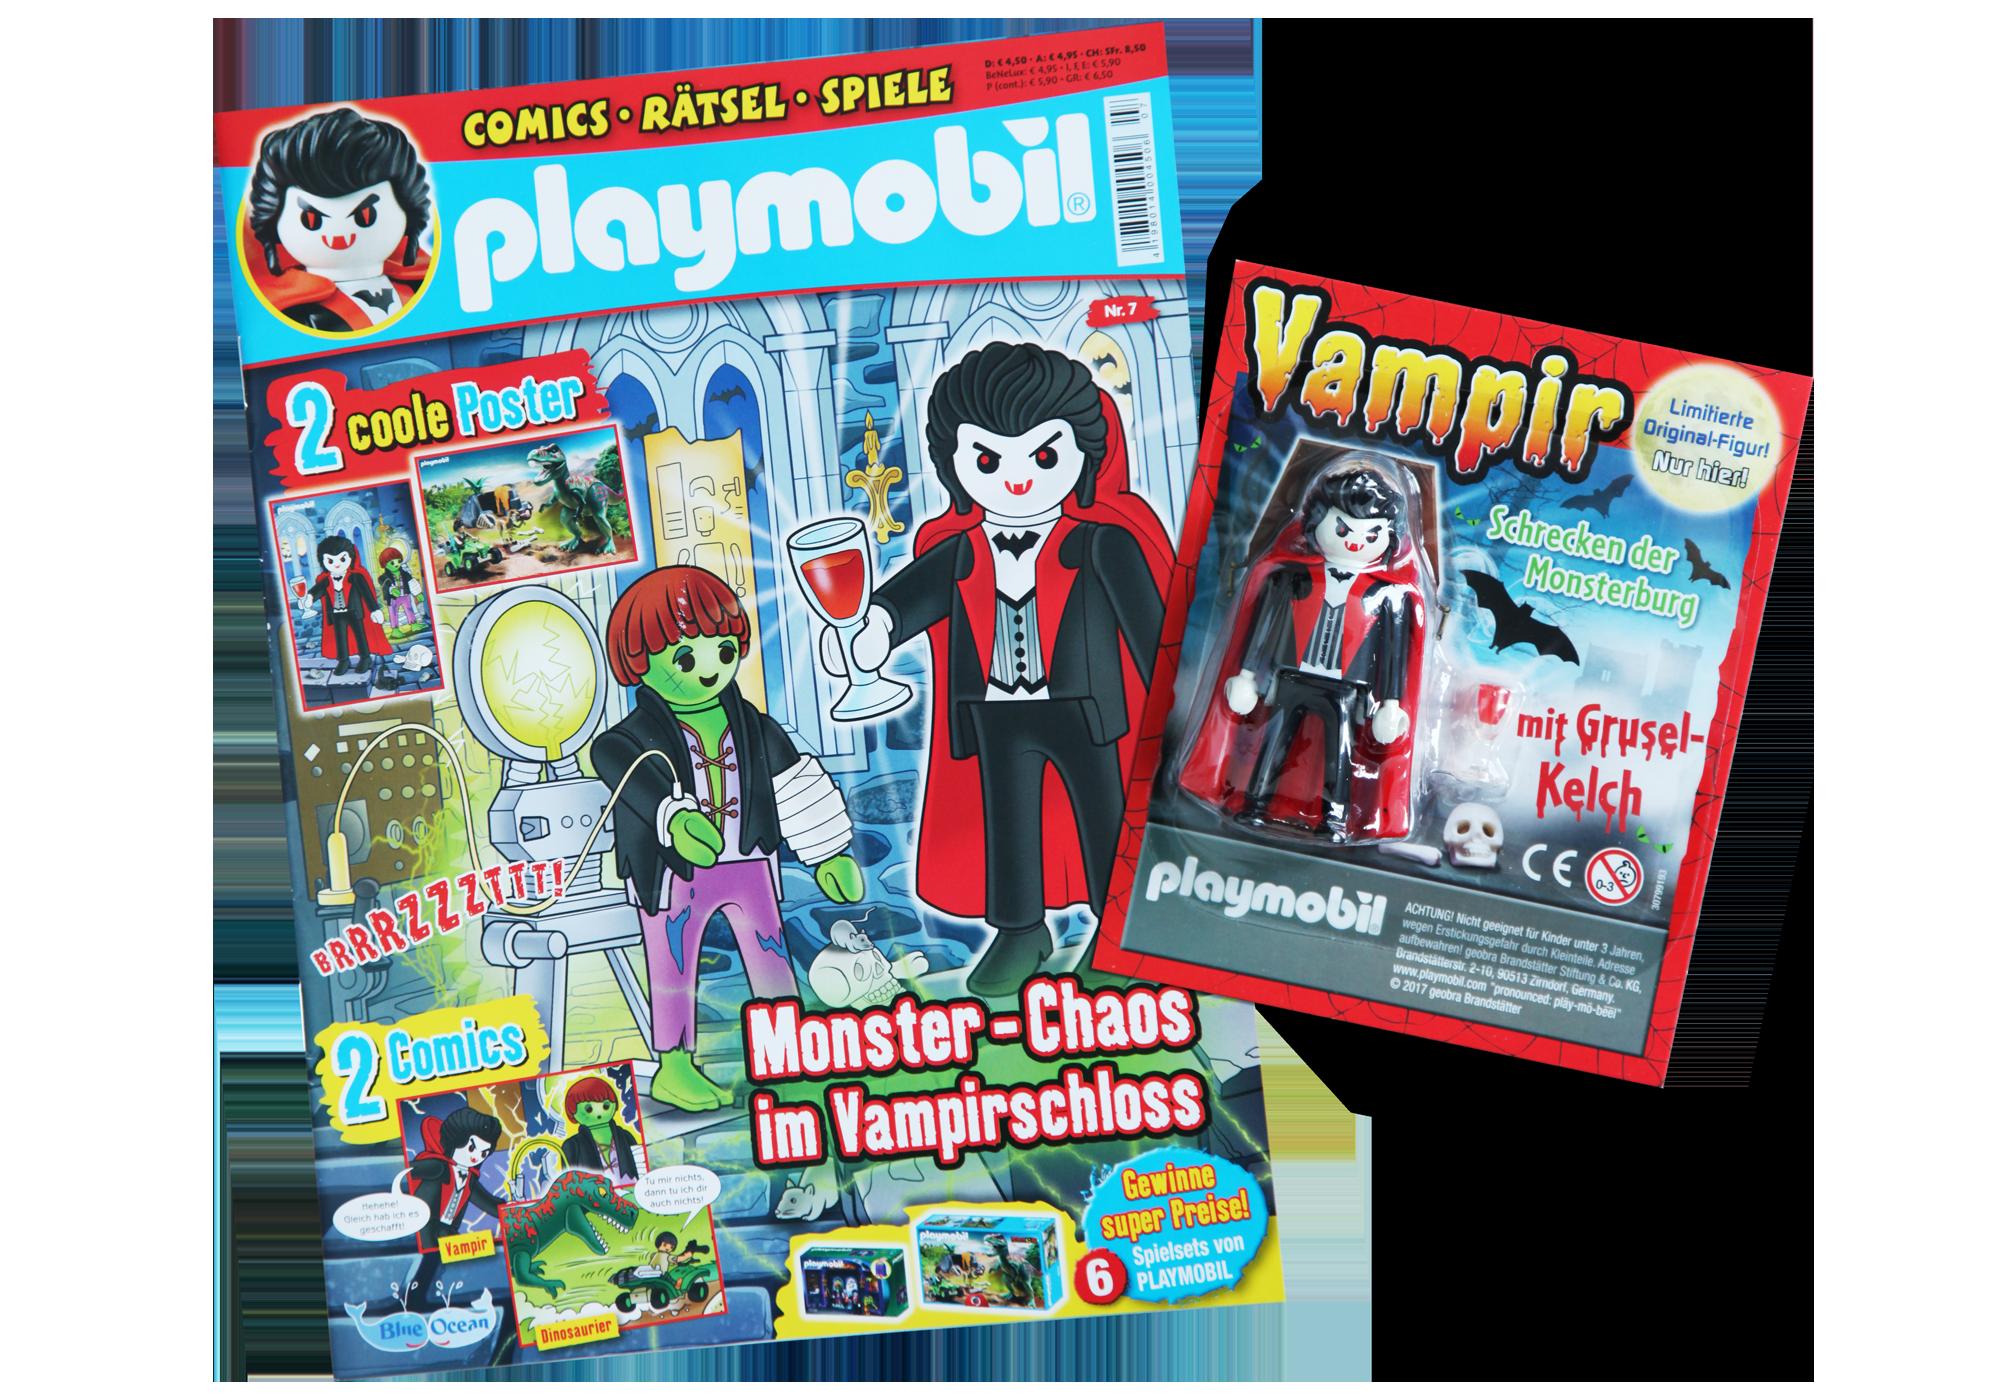 http://media.playmobil.com/i/playmobil/80595_product_detail/PLAYMOBIL-Magazin 7/2017 (Heft 56)